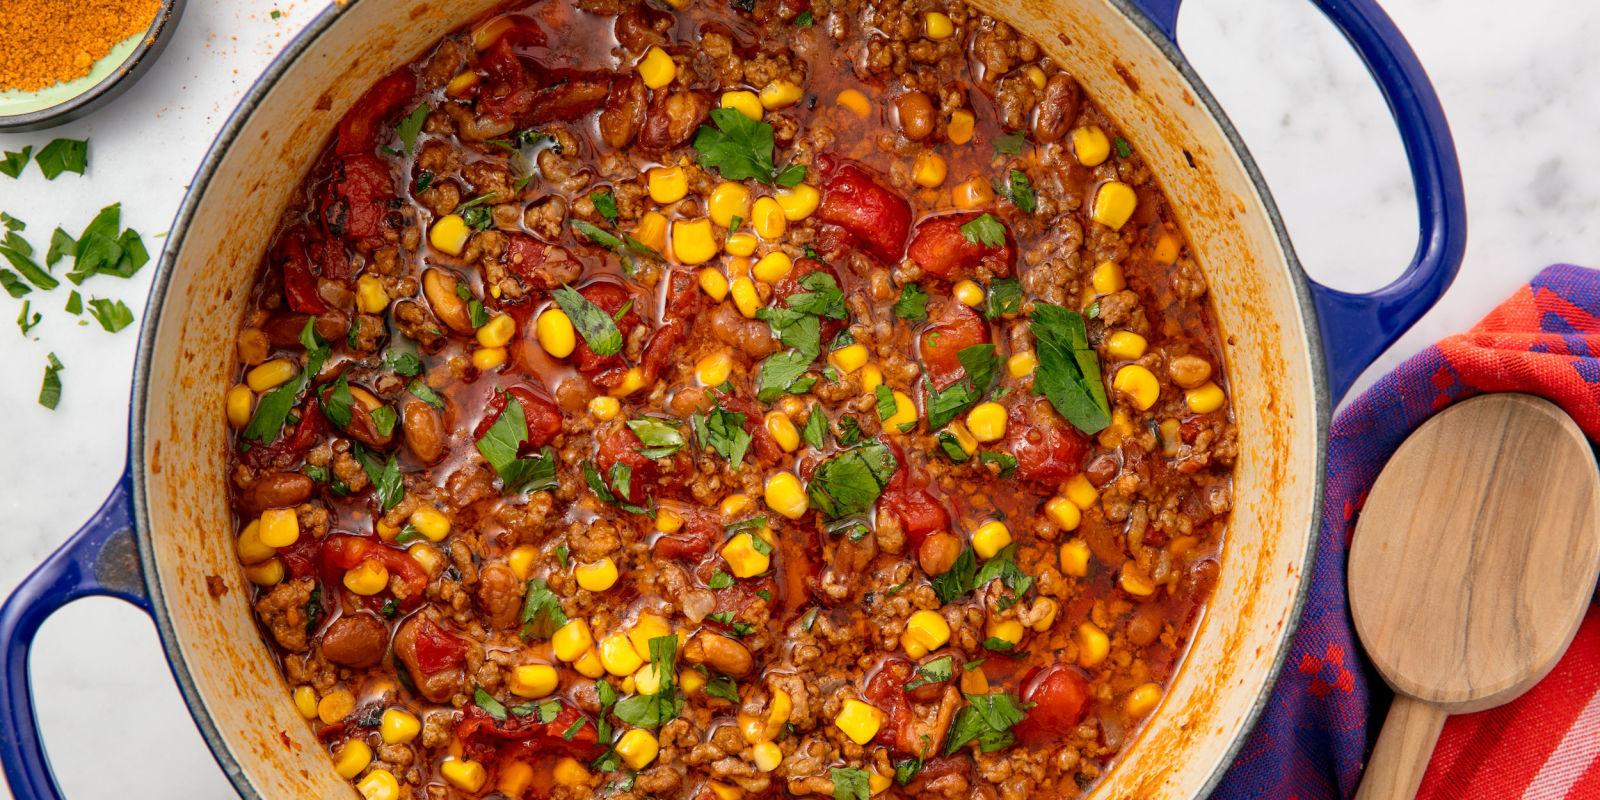 Lindsay Funston Easy Taco Soup Recipe How To Make Taco Soup